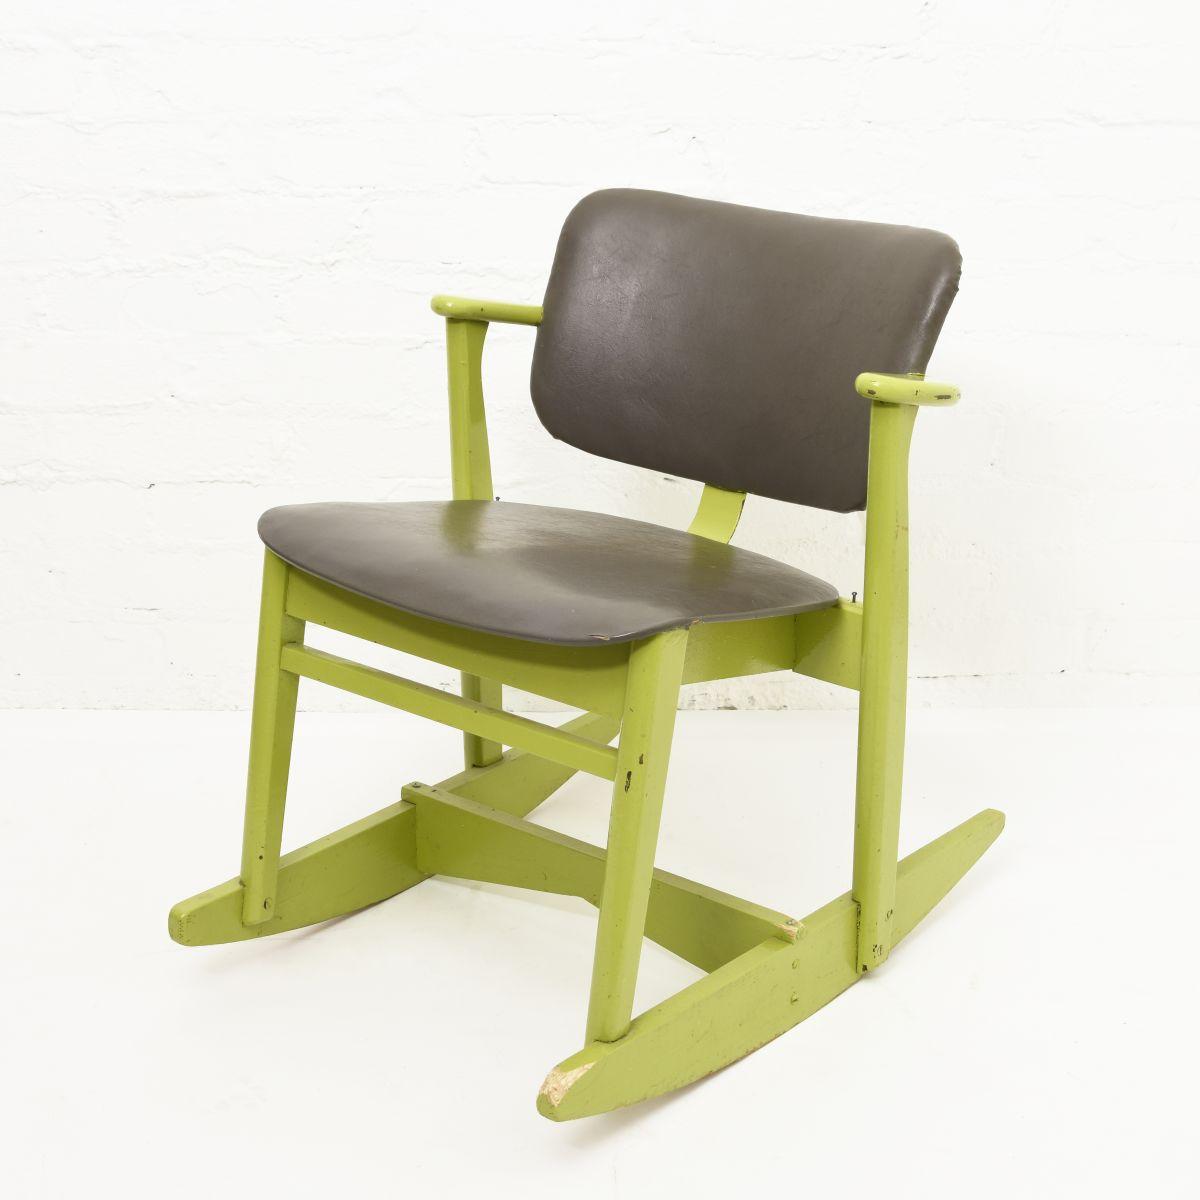 Tapiovaara-Ilmari-Domus-Chair-Rocking